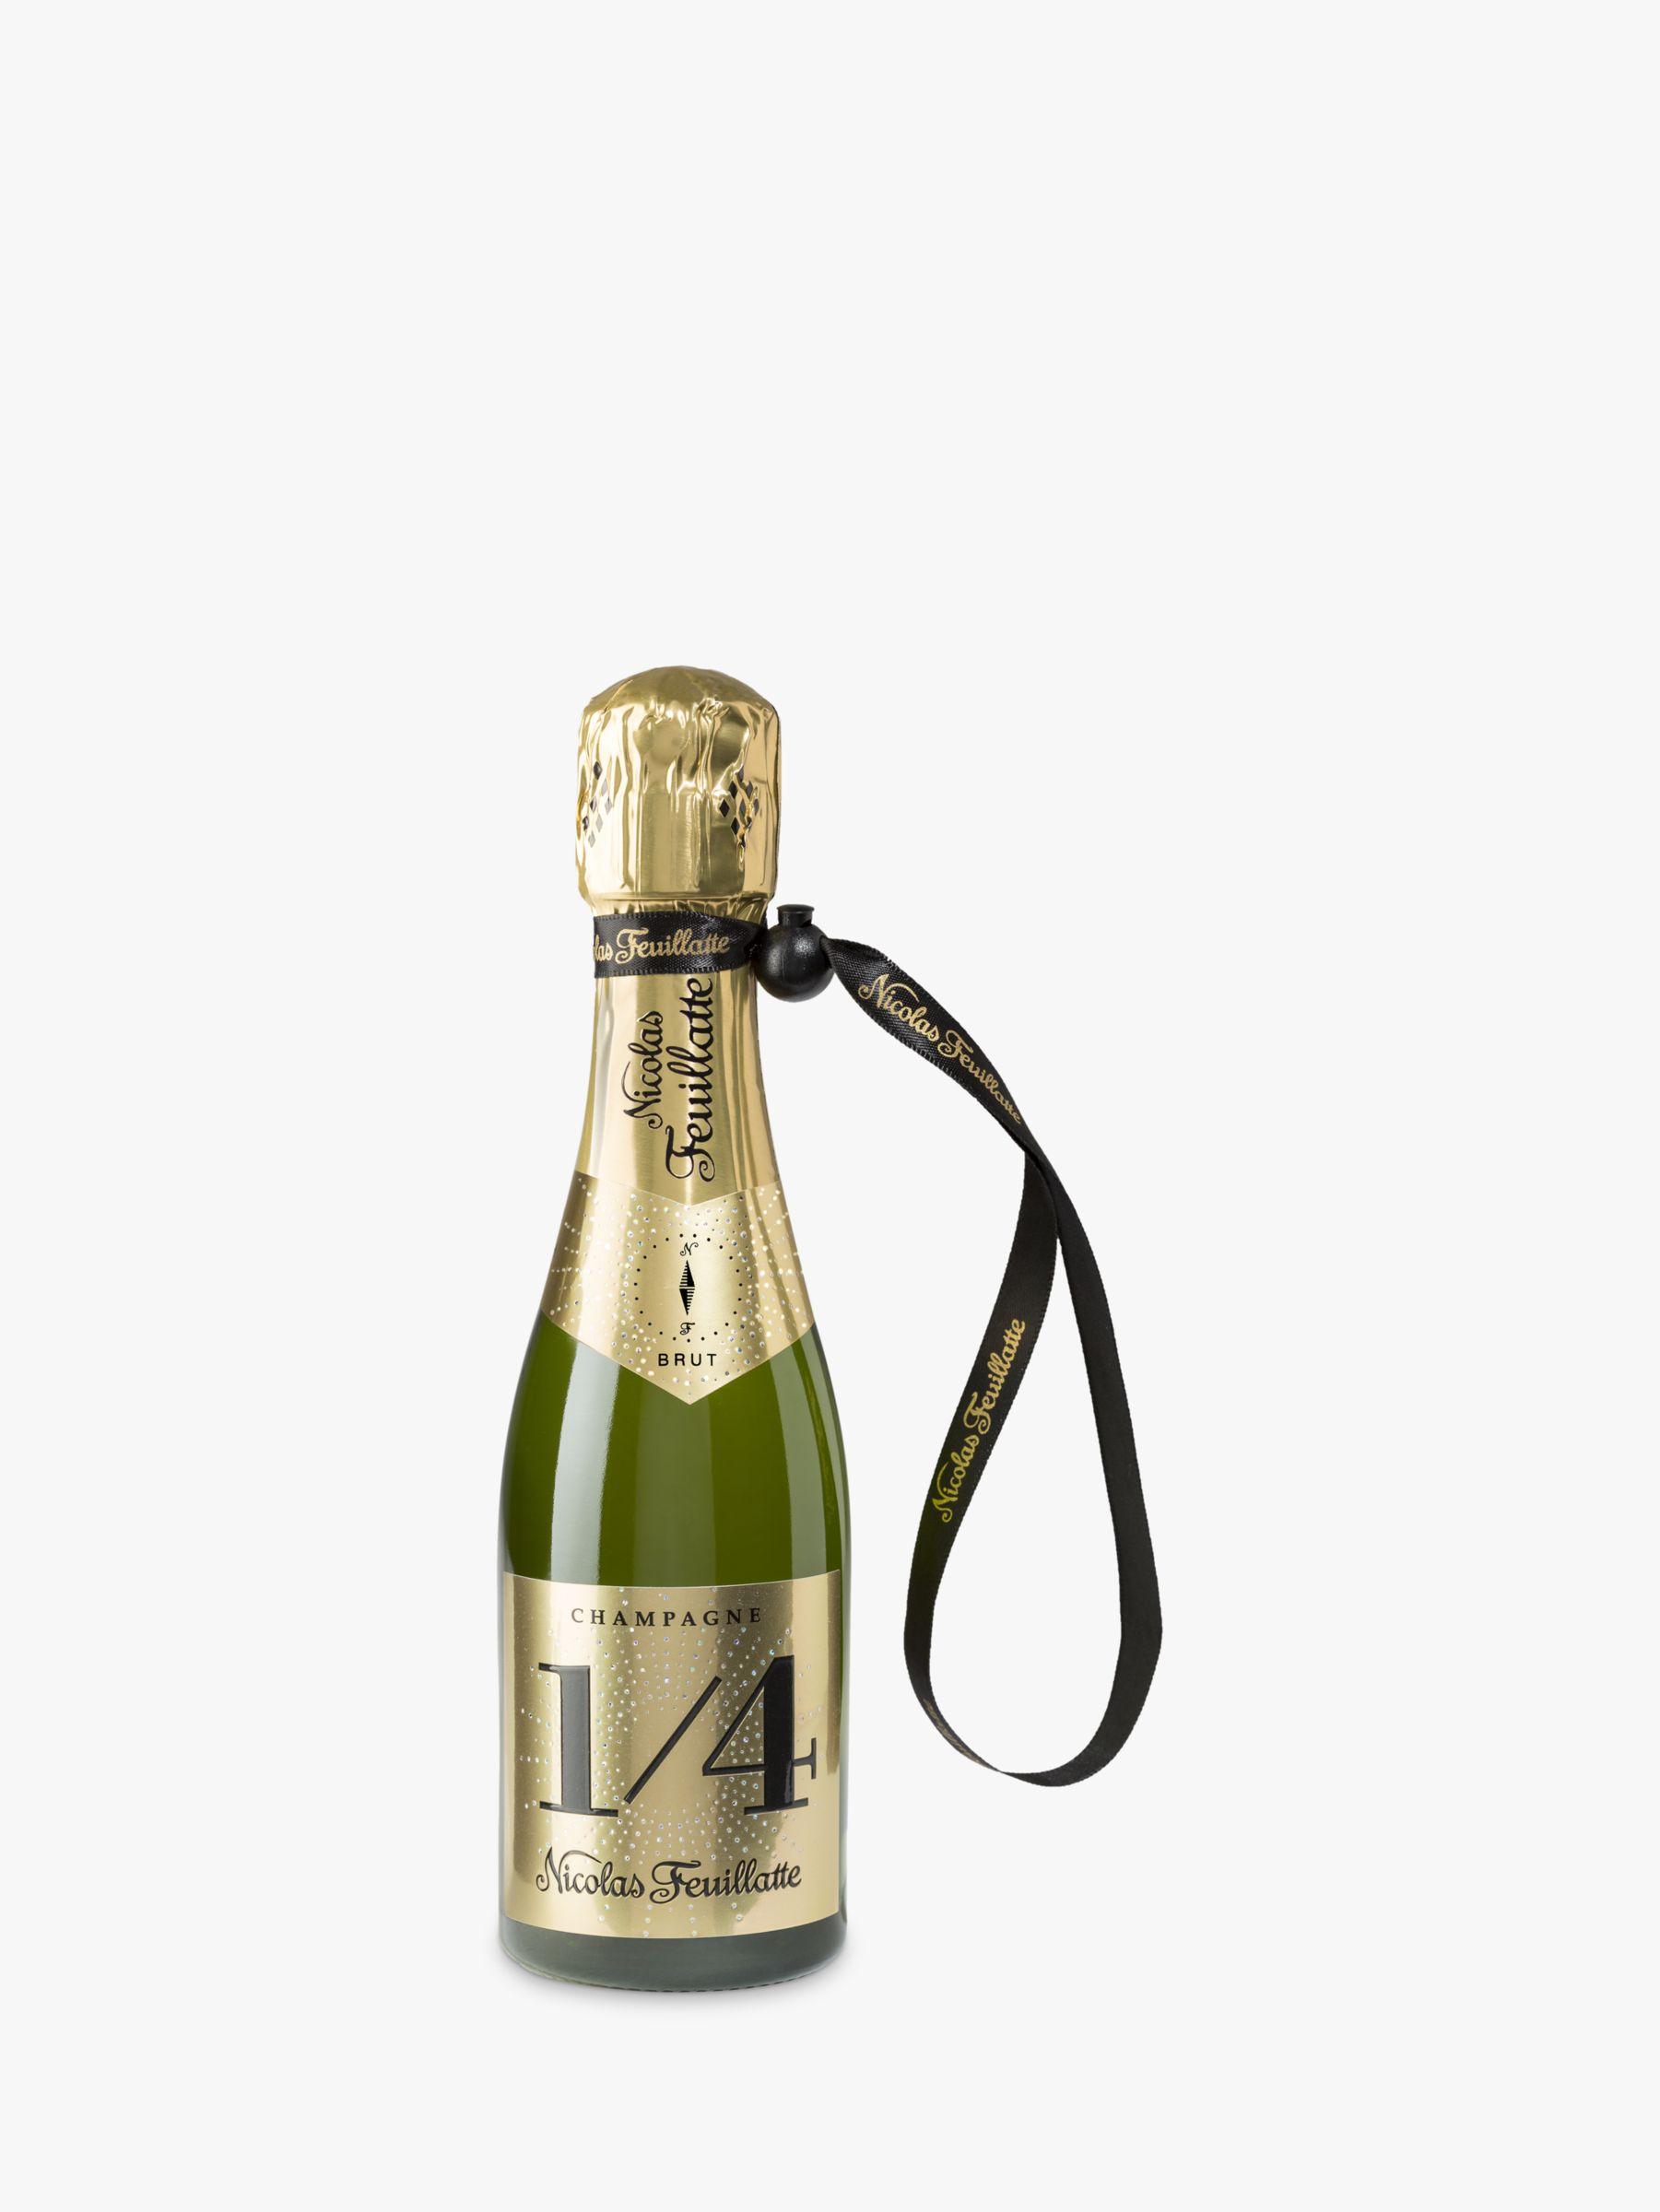 Nicolas Feuillatte Champagne Nicolas Feuillatte One Fo(u)r Brut with a Jacket, 20cl